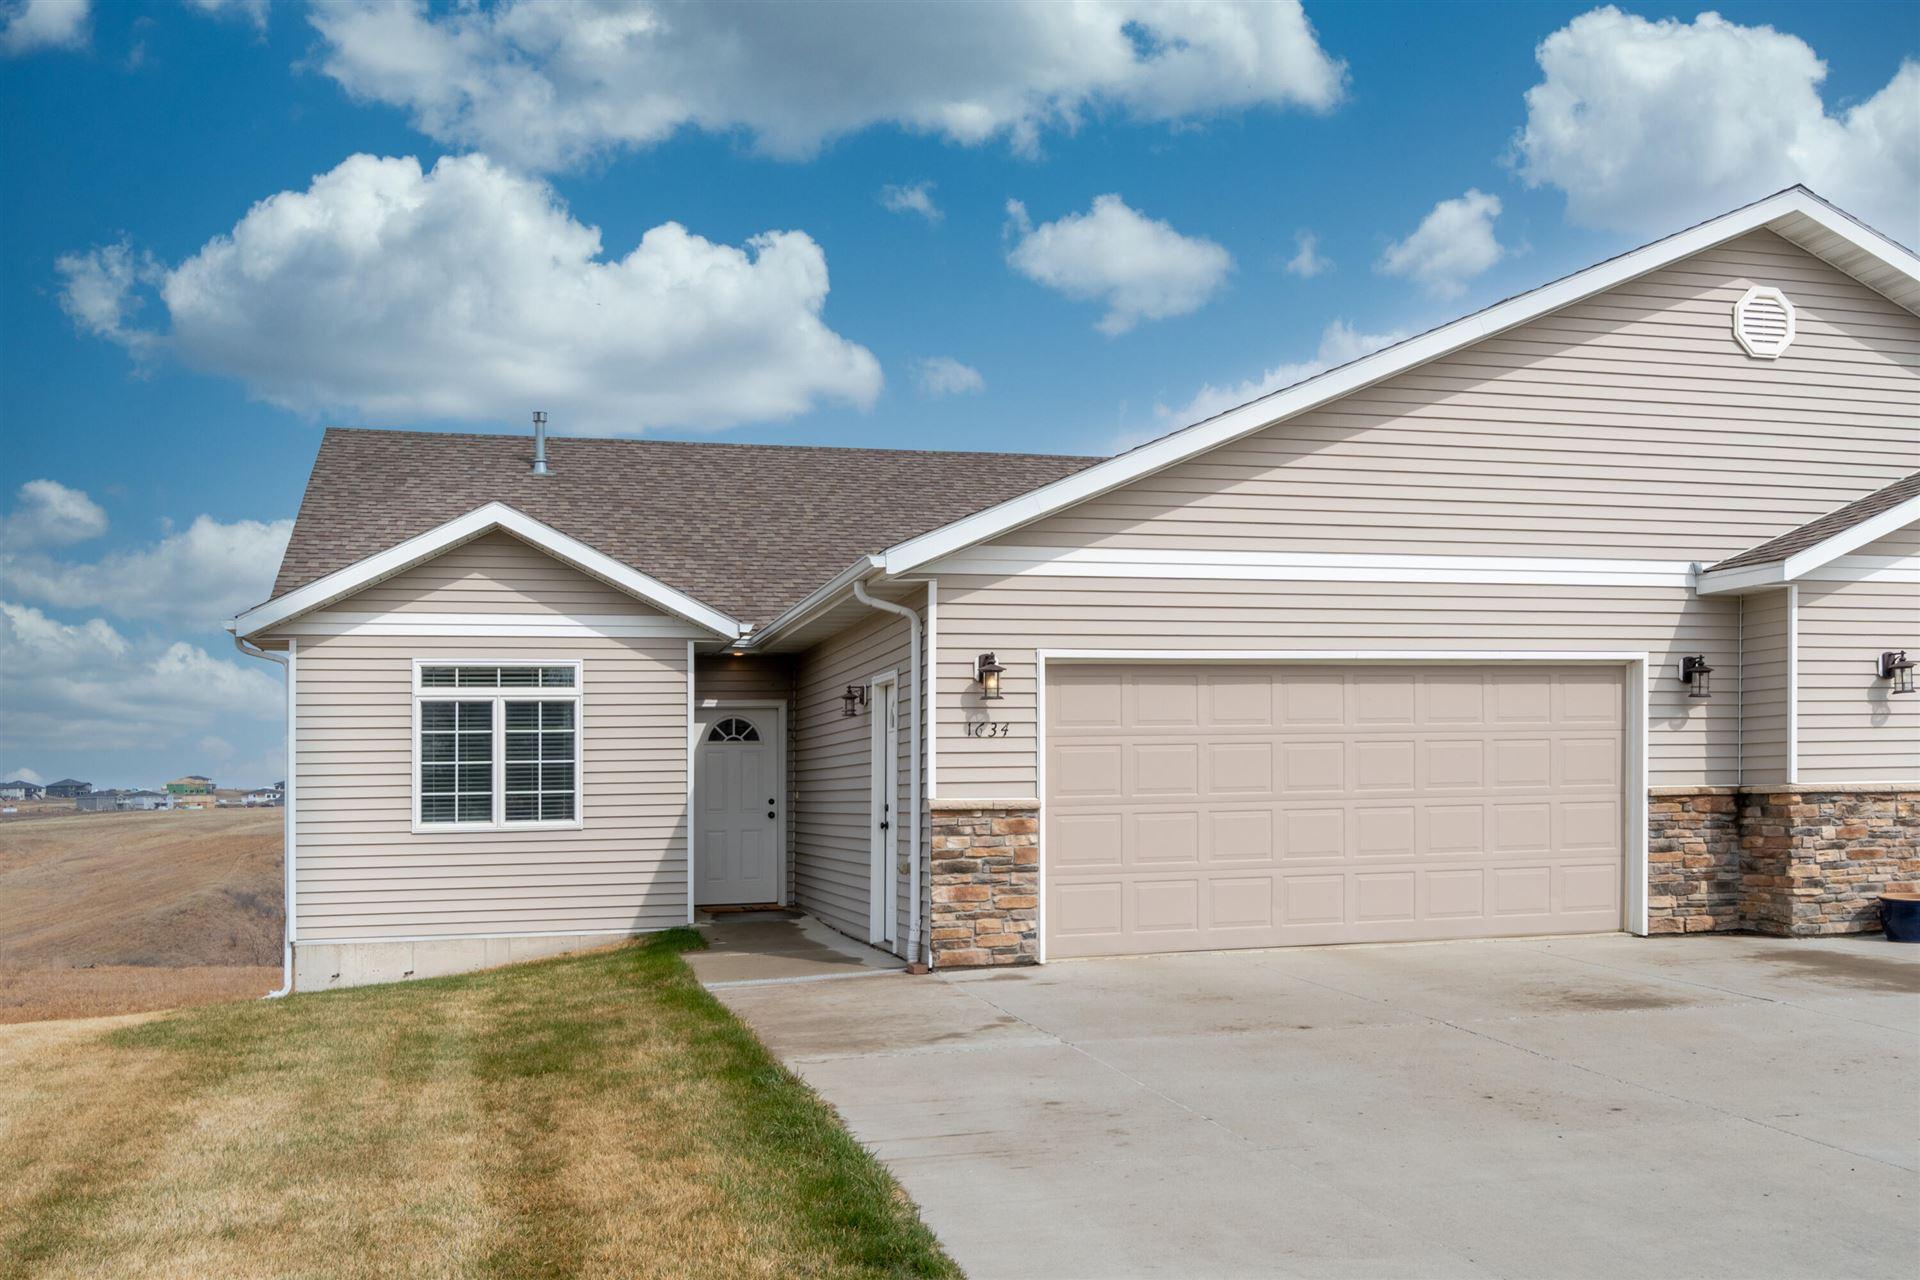 1634 Valley Drive, Bismarck, ND 58503 - #: 410611